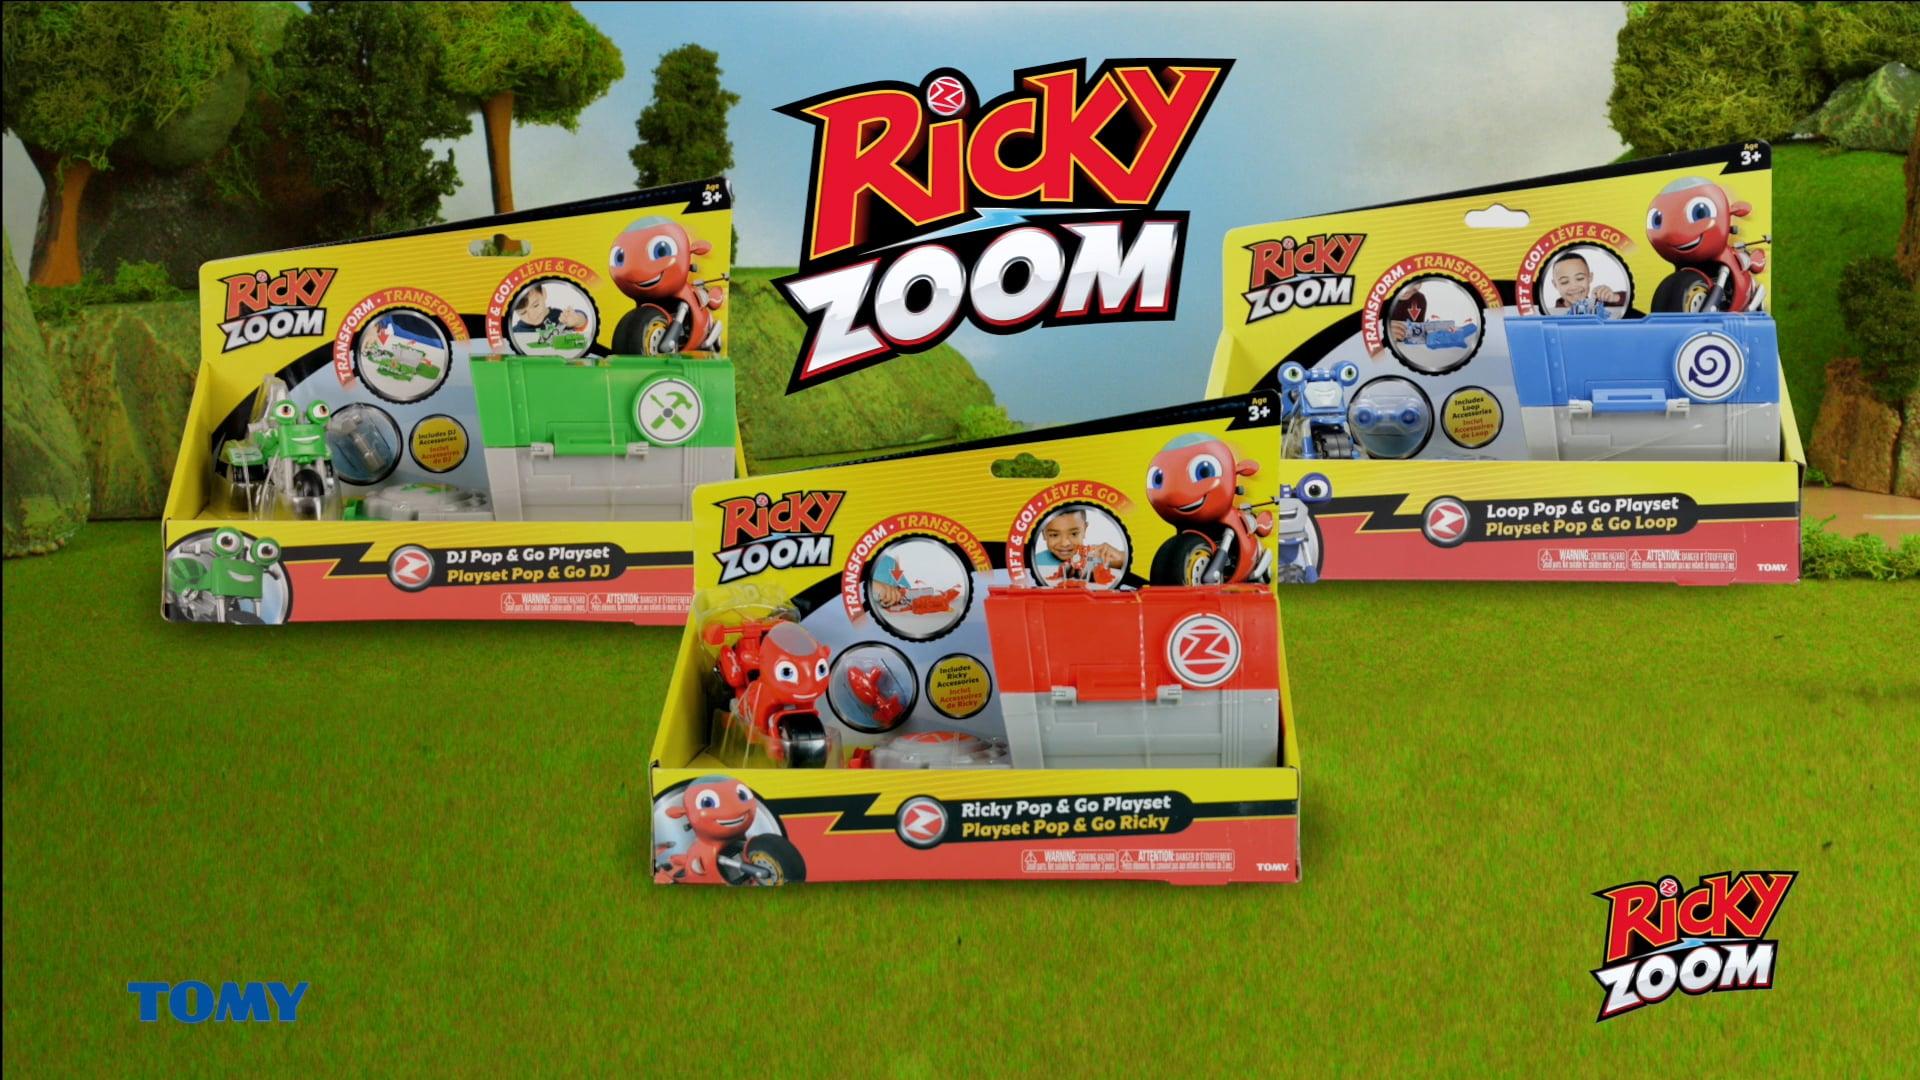 Rickyzoom - pop and go